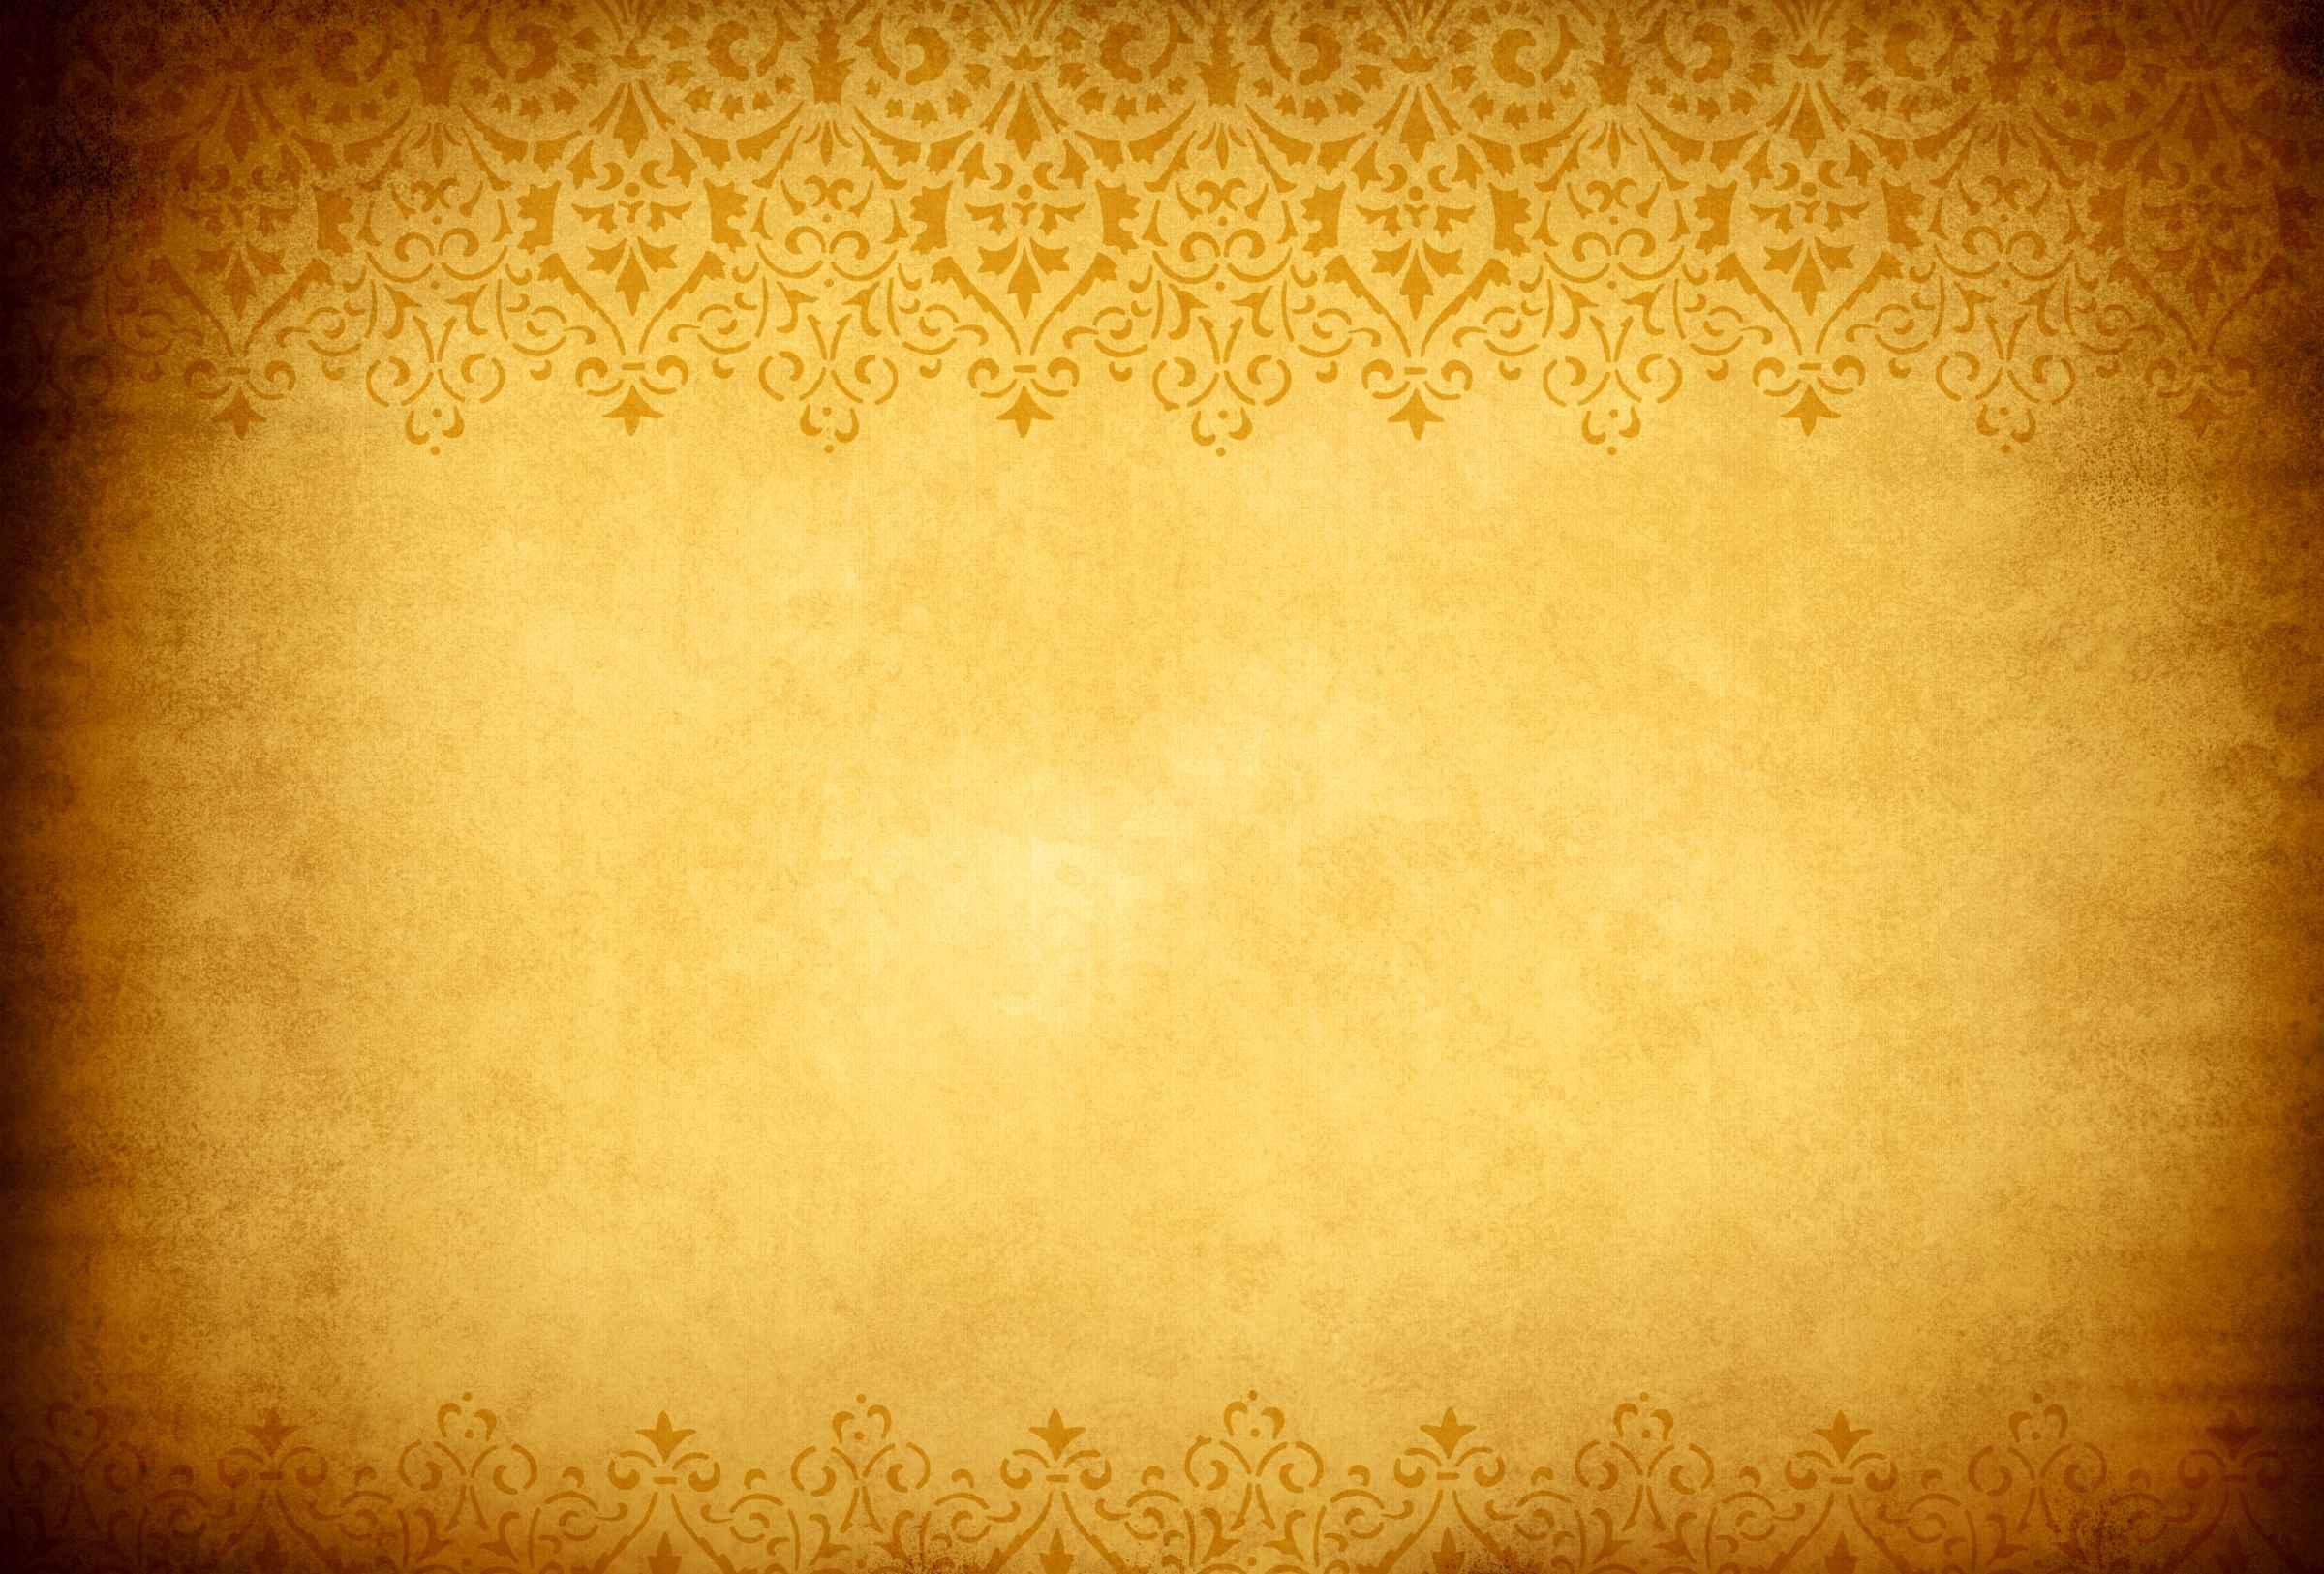 biblical backgrounds wallpaper cave